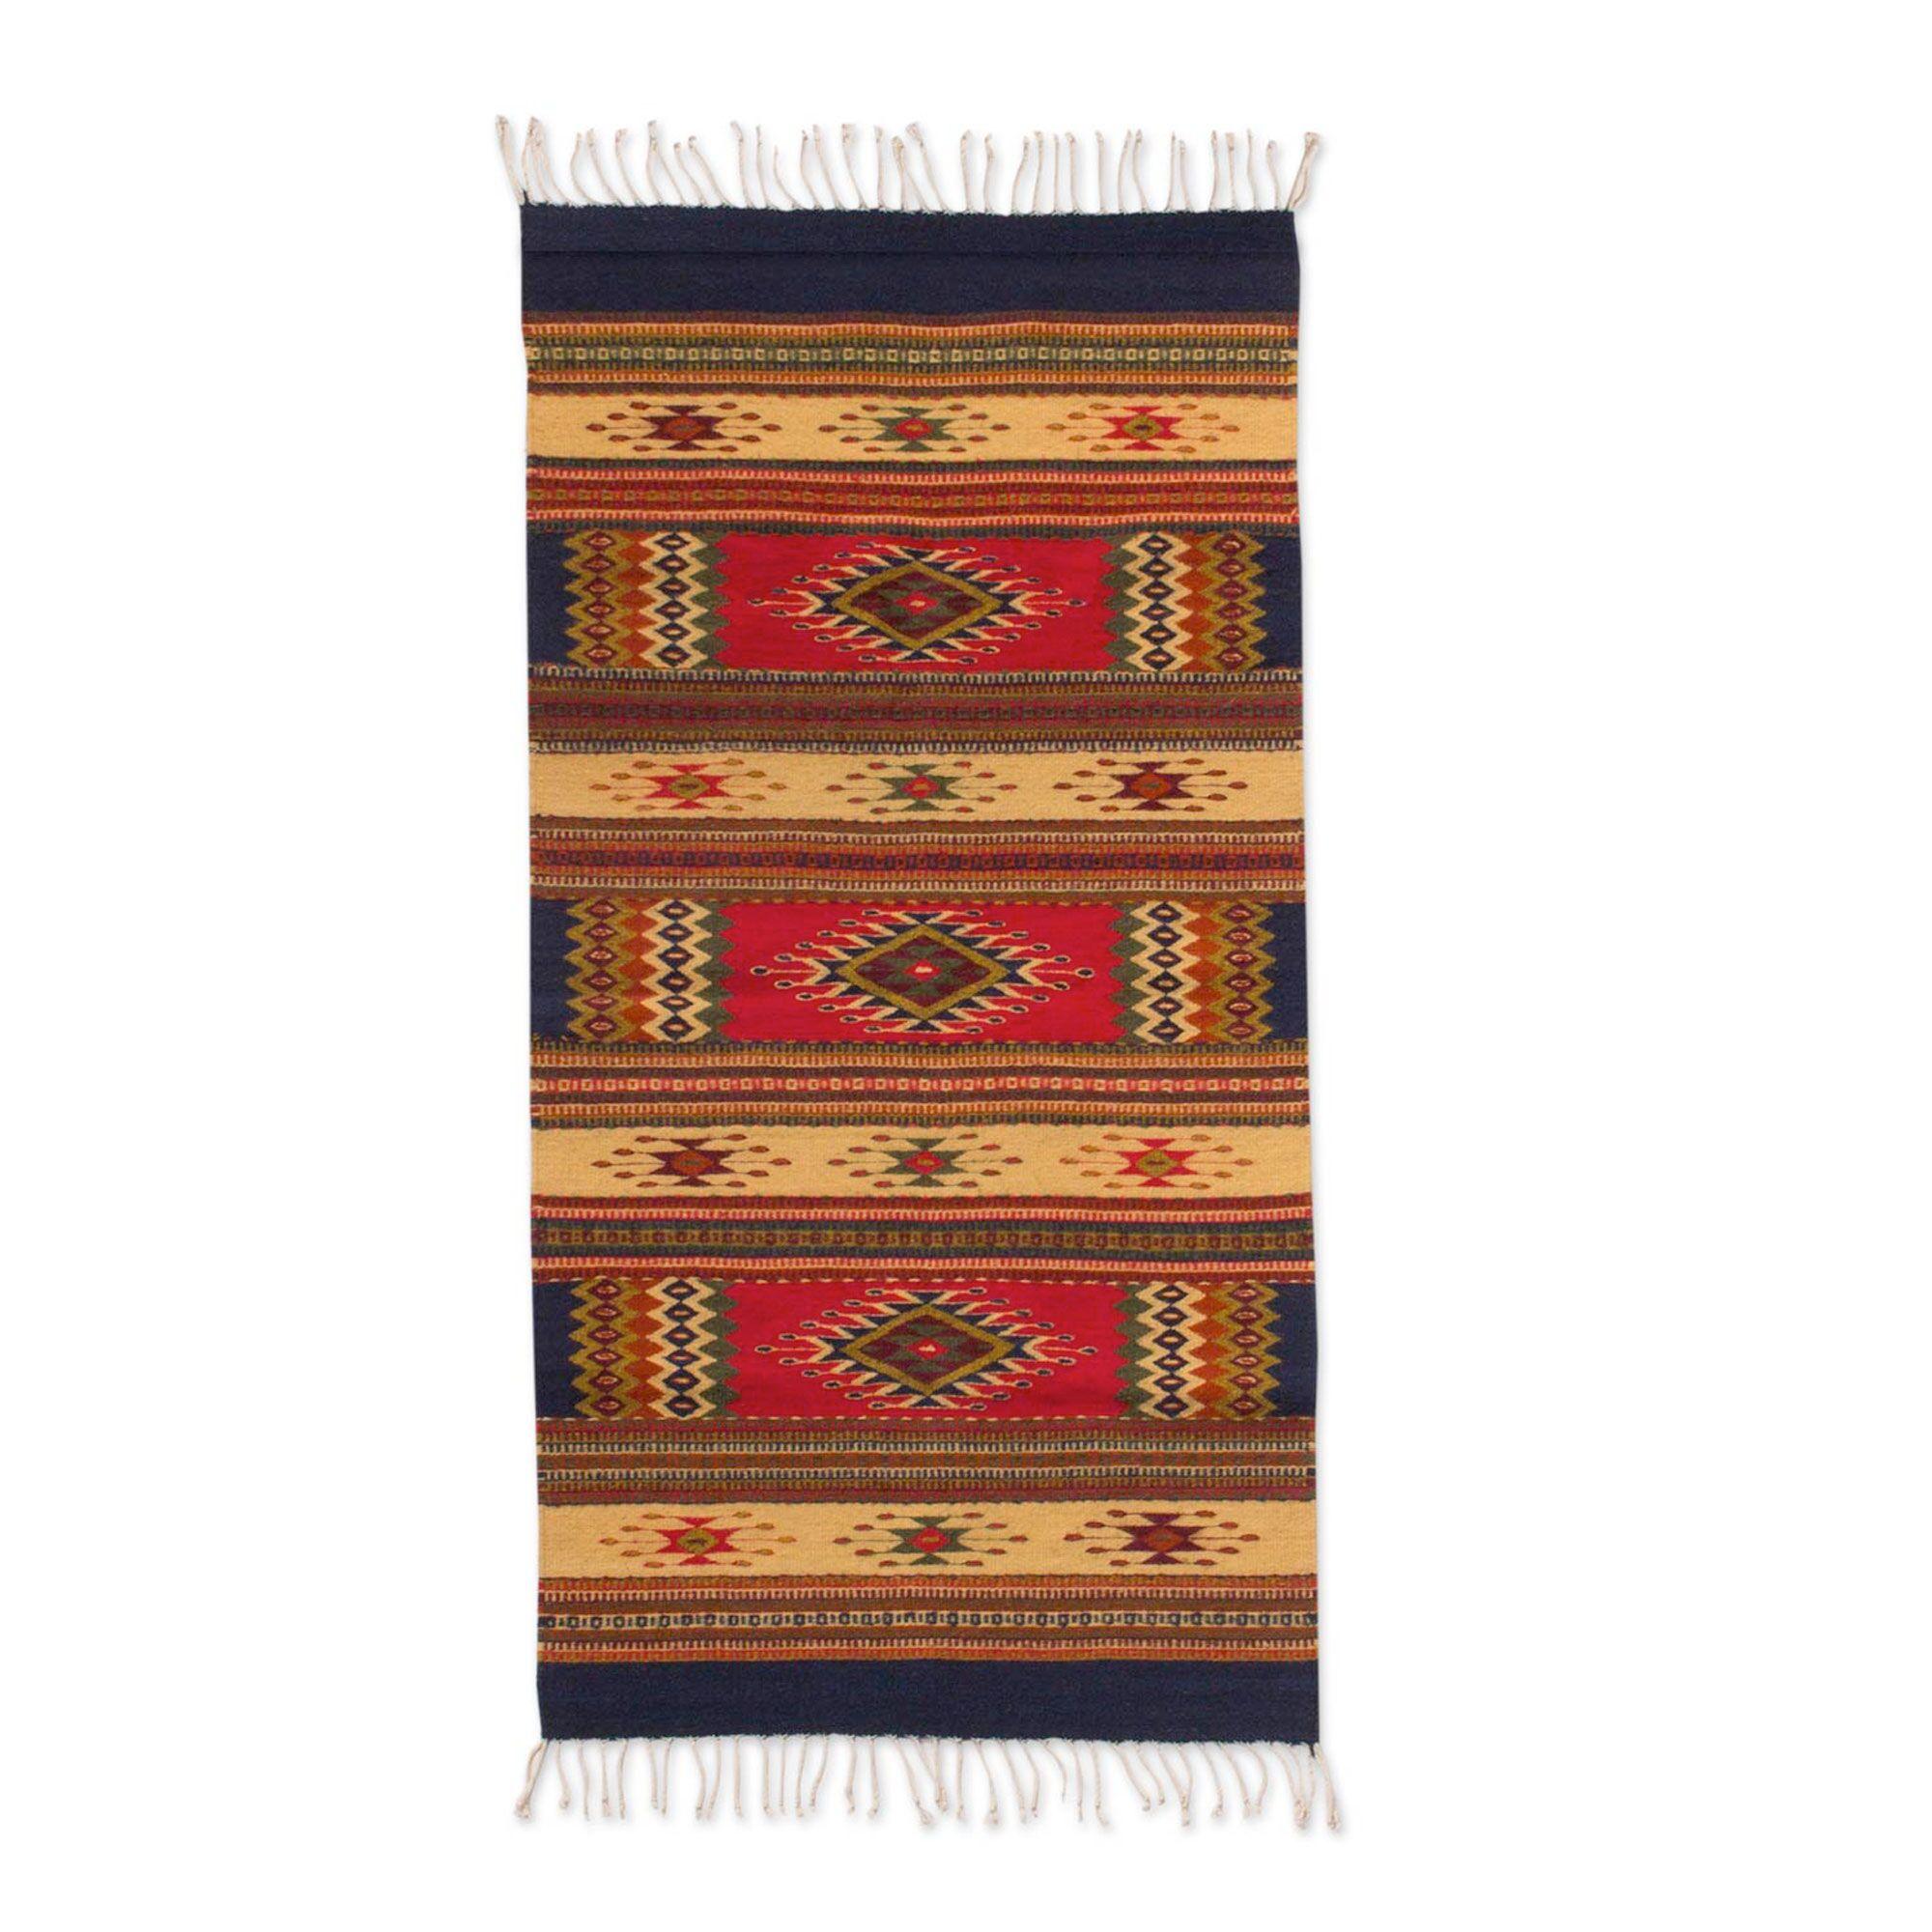 Hand Woven Brown Area Rug